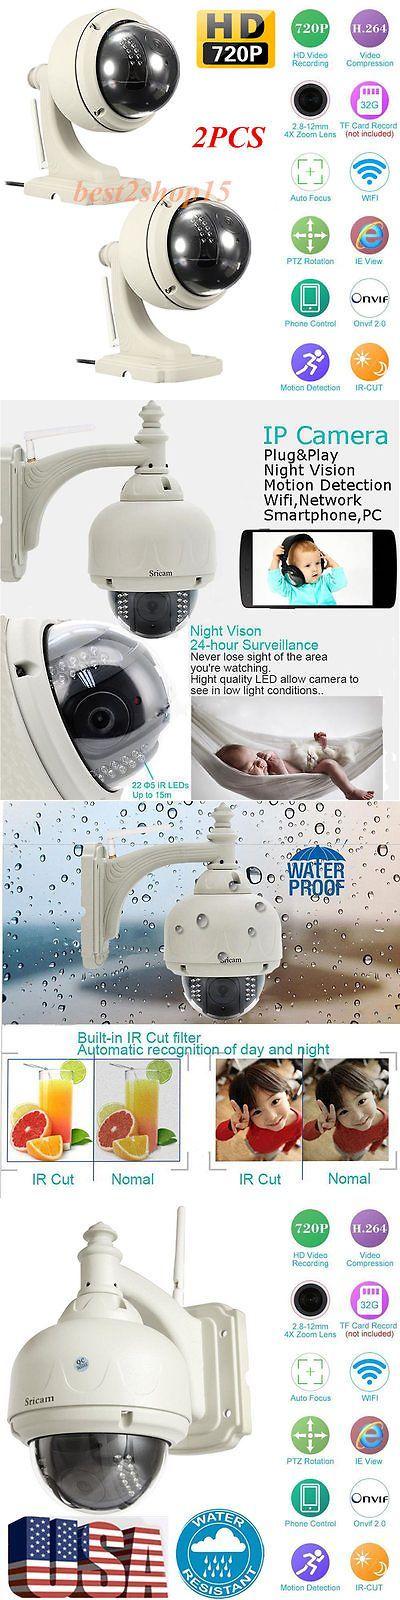 Security Cameras: 2 Sricam Wireless Outdoor Pan/Tilt Network Cctv Camera P2p Wifi Ip Webcam Ir-Cut BUY IT NOW ONLY: $118.95